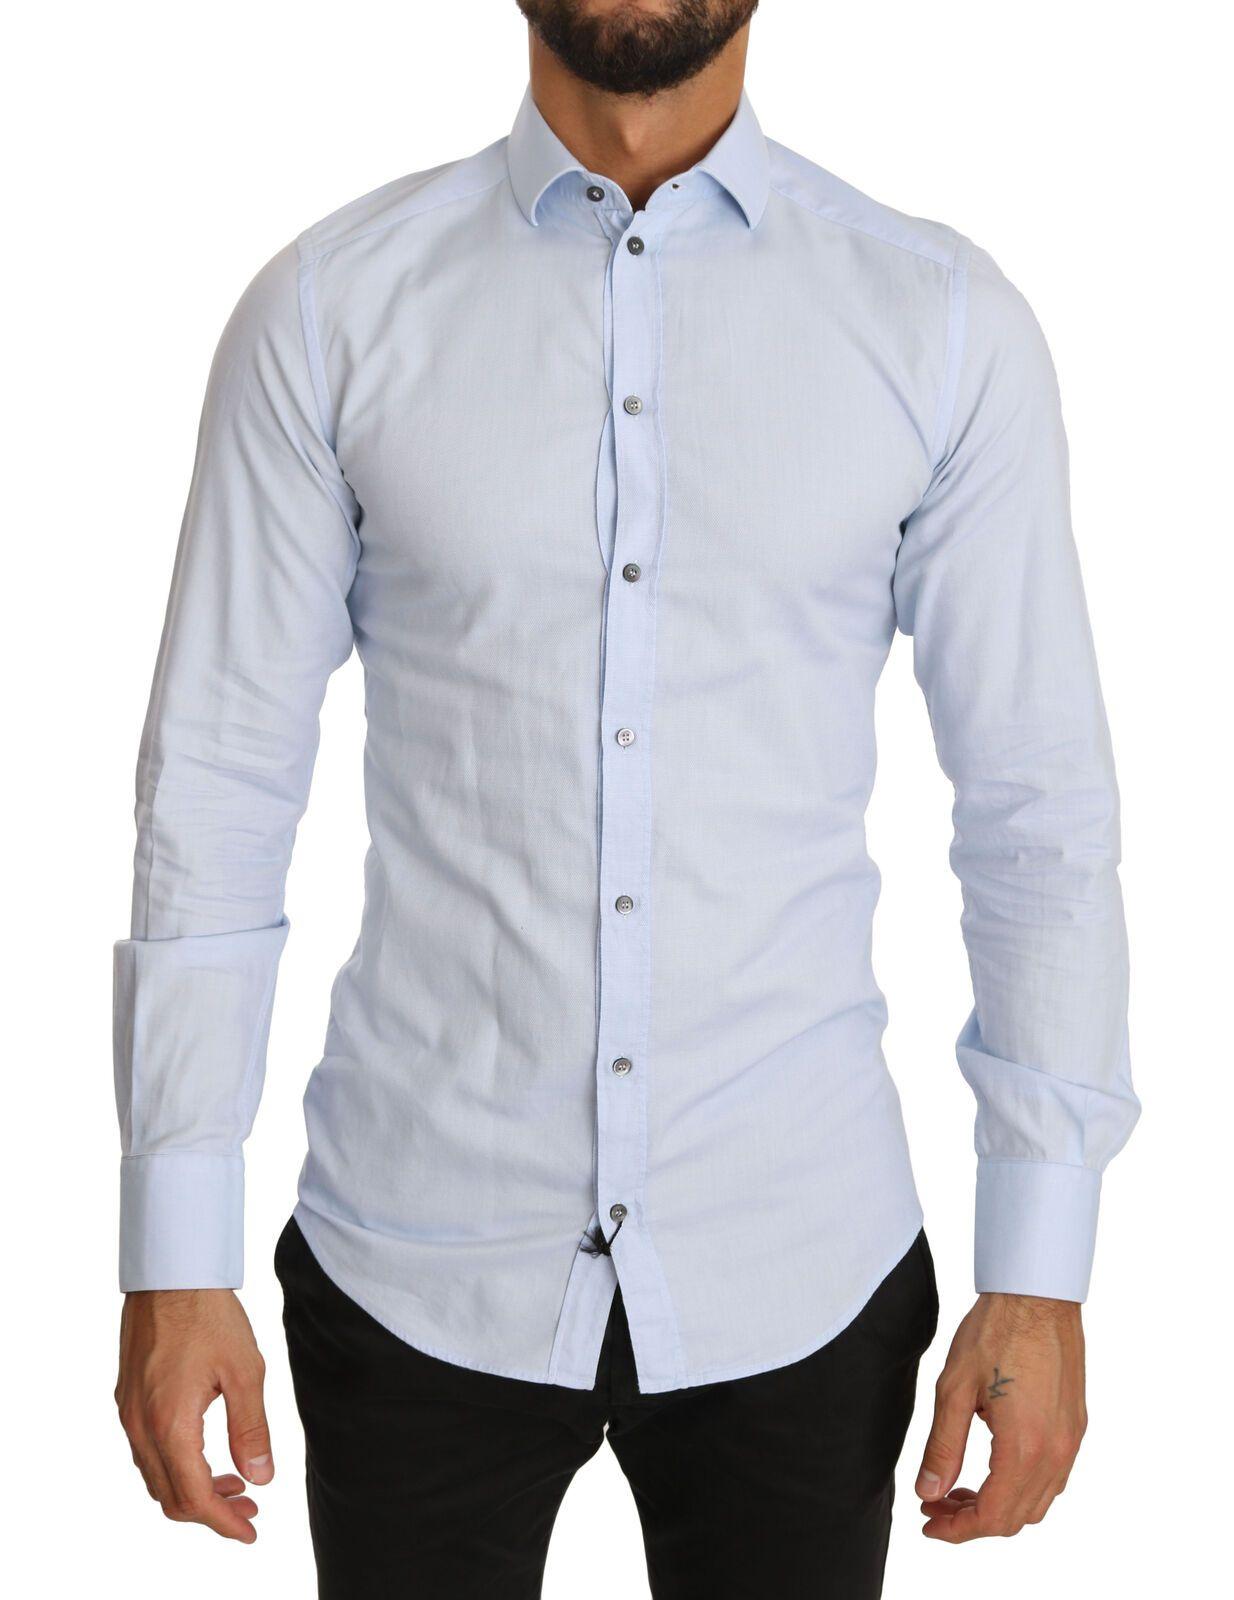 Dolce & Gabbana Men's Formal Dress Cotton Shirt light Blue TSH3900 - IT38 | XS